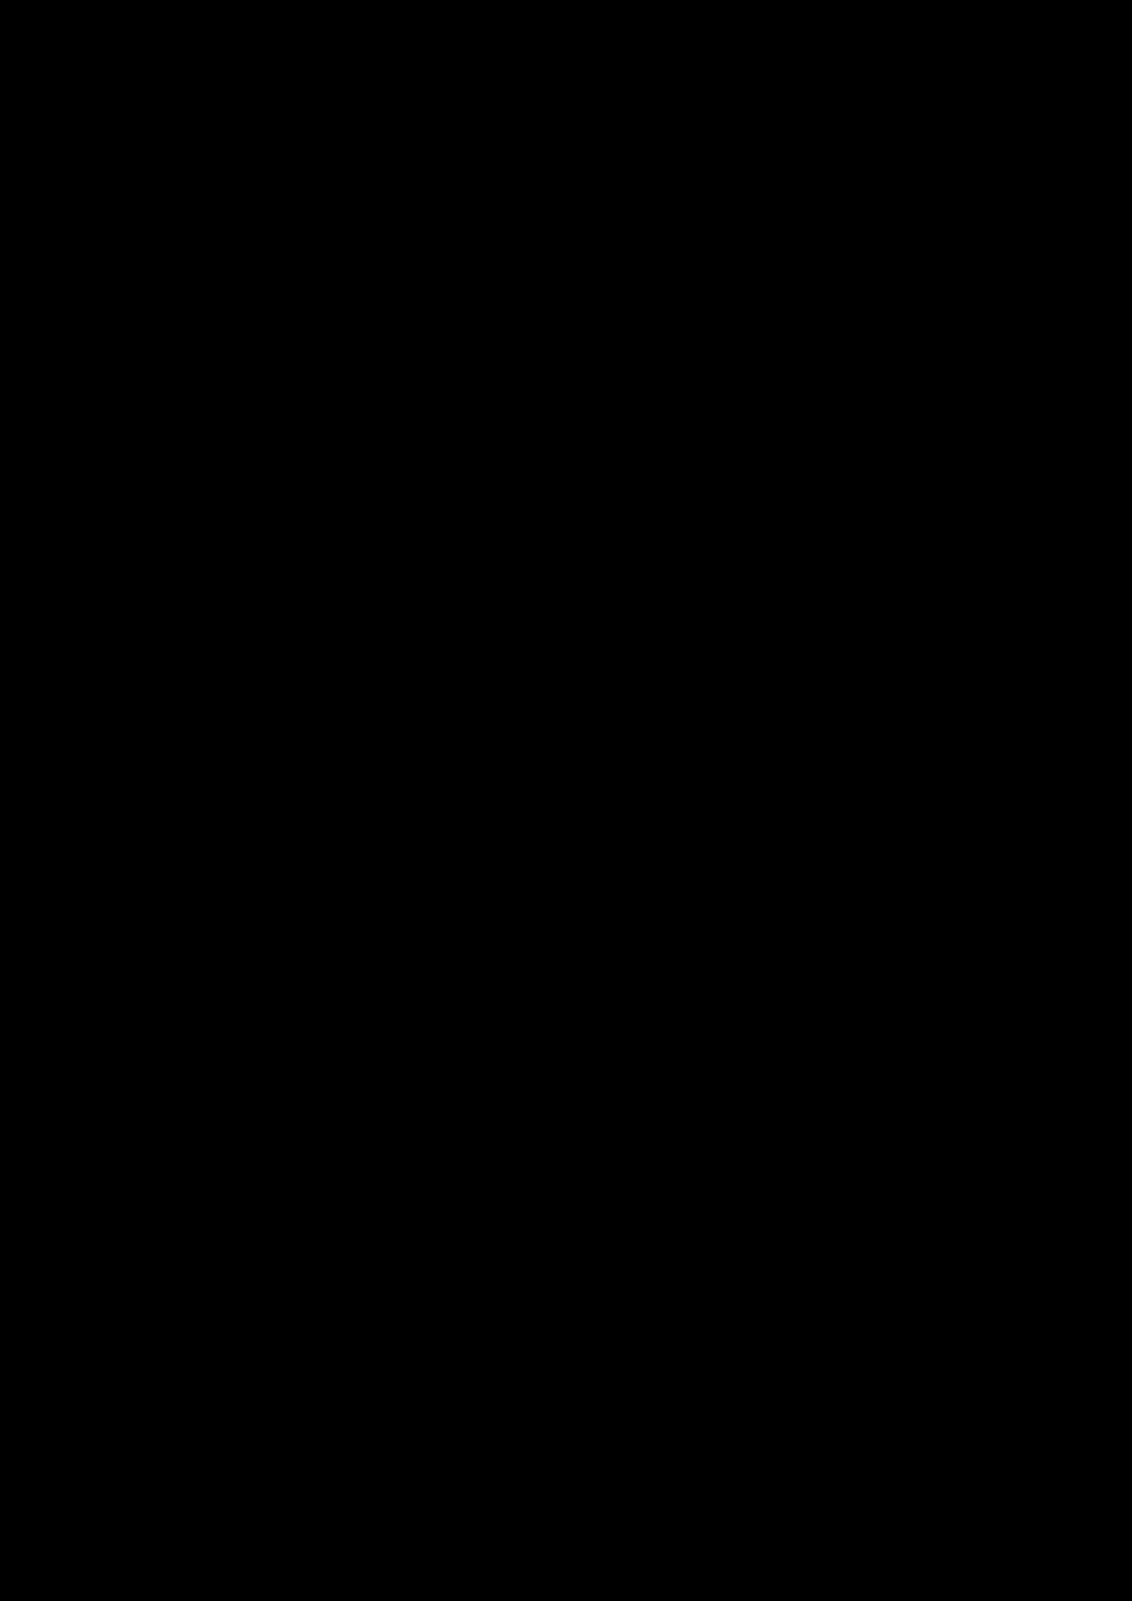 Ten lyubvi slide, Image 16